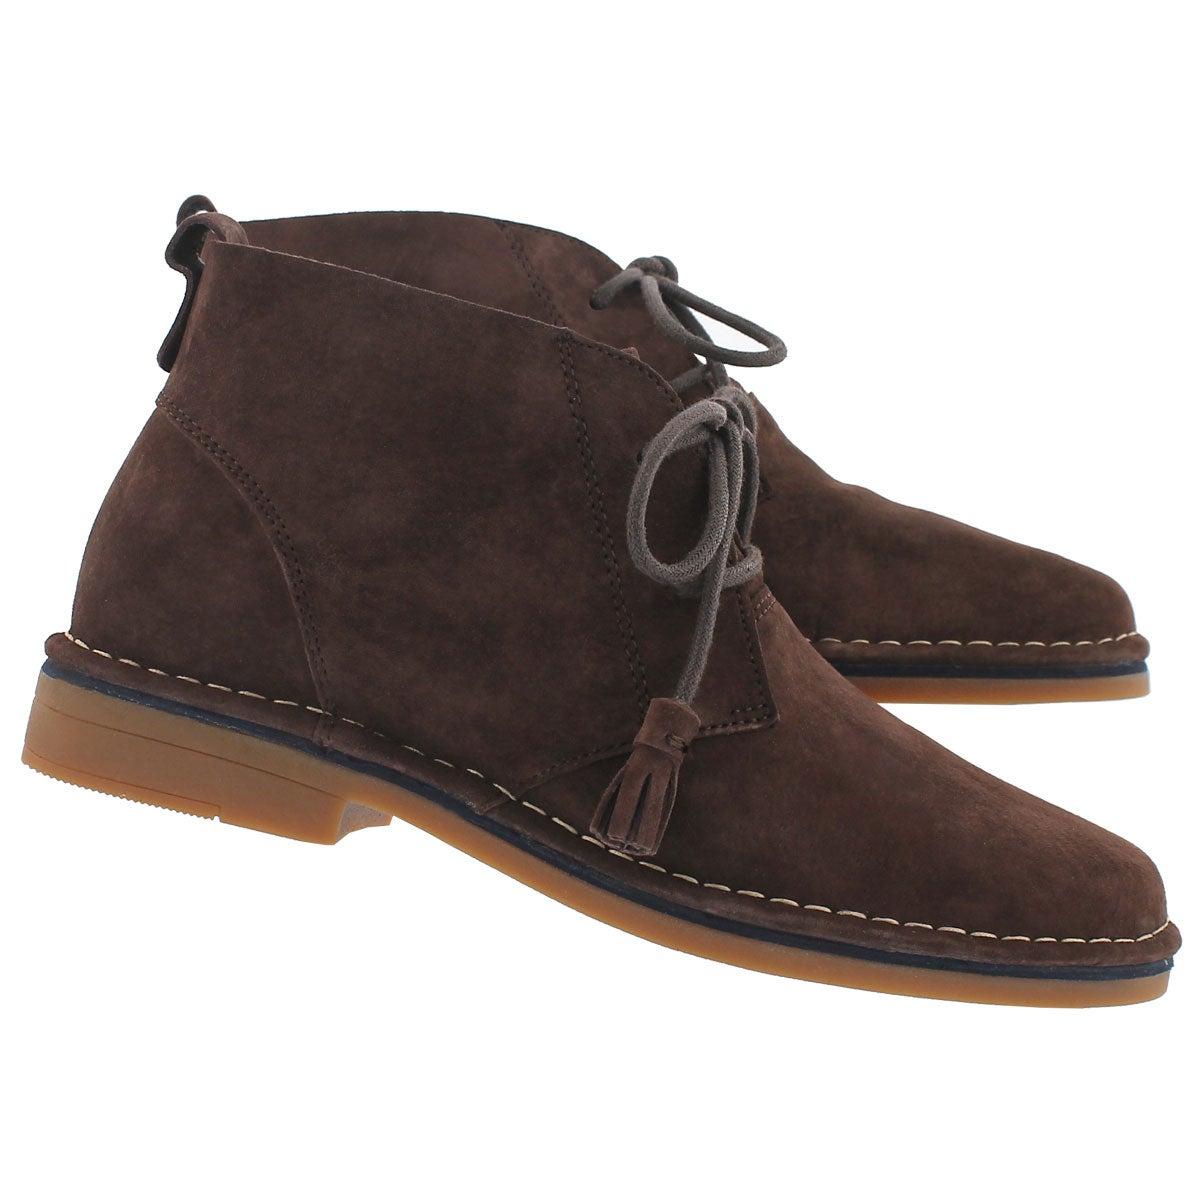 Lds Cyra Catelyn dk brown chukka boot